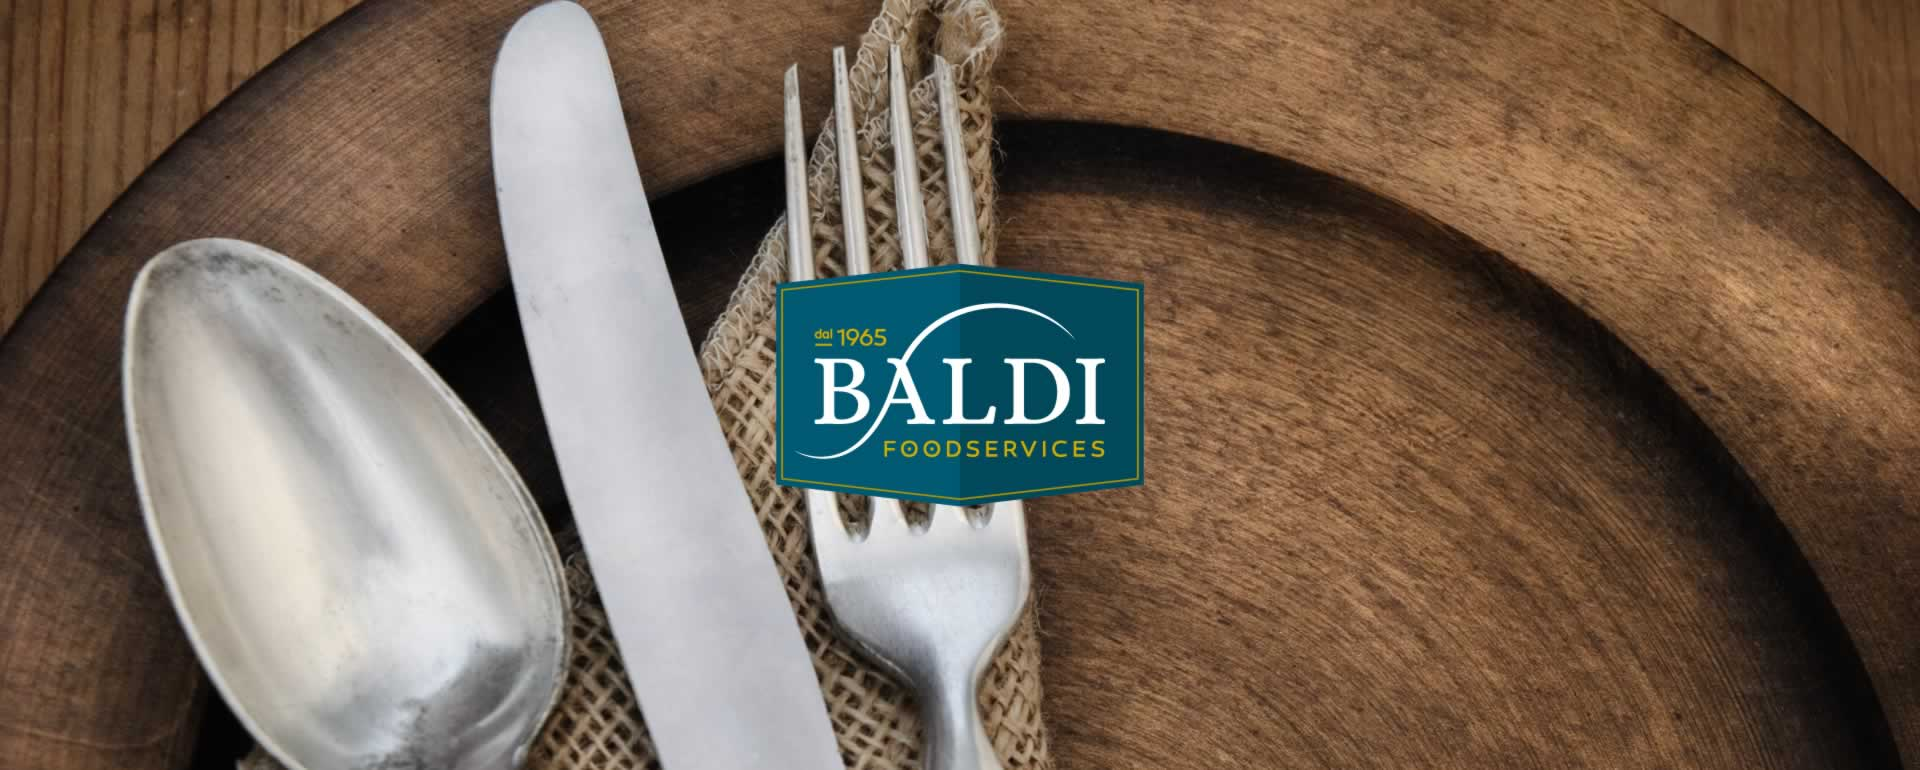 baldifoodservices